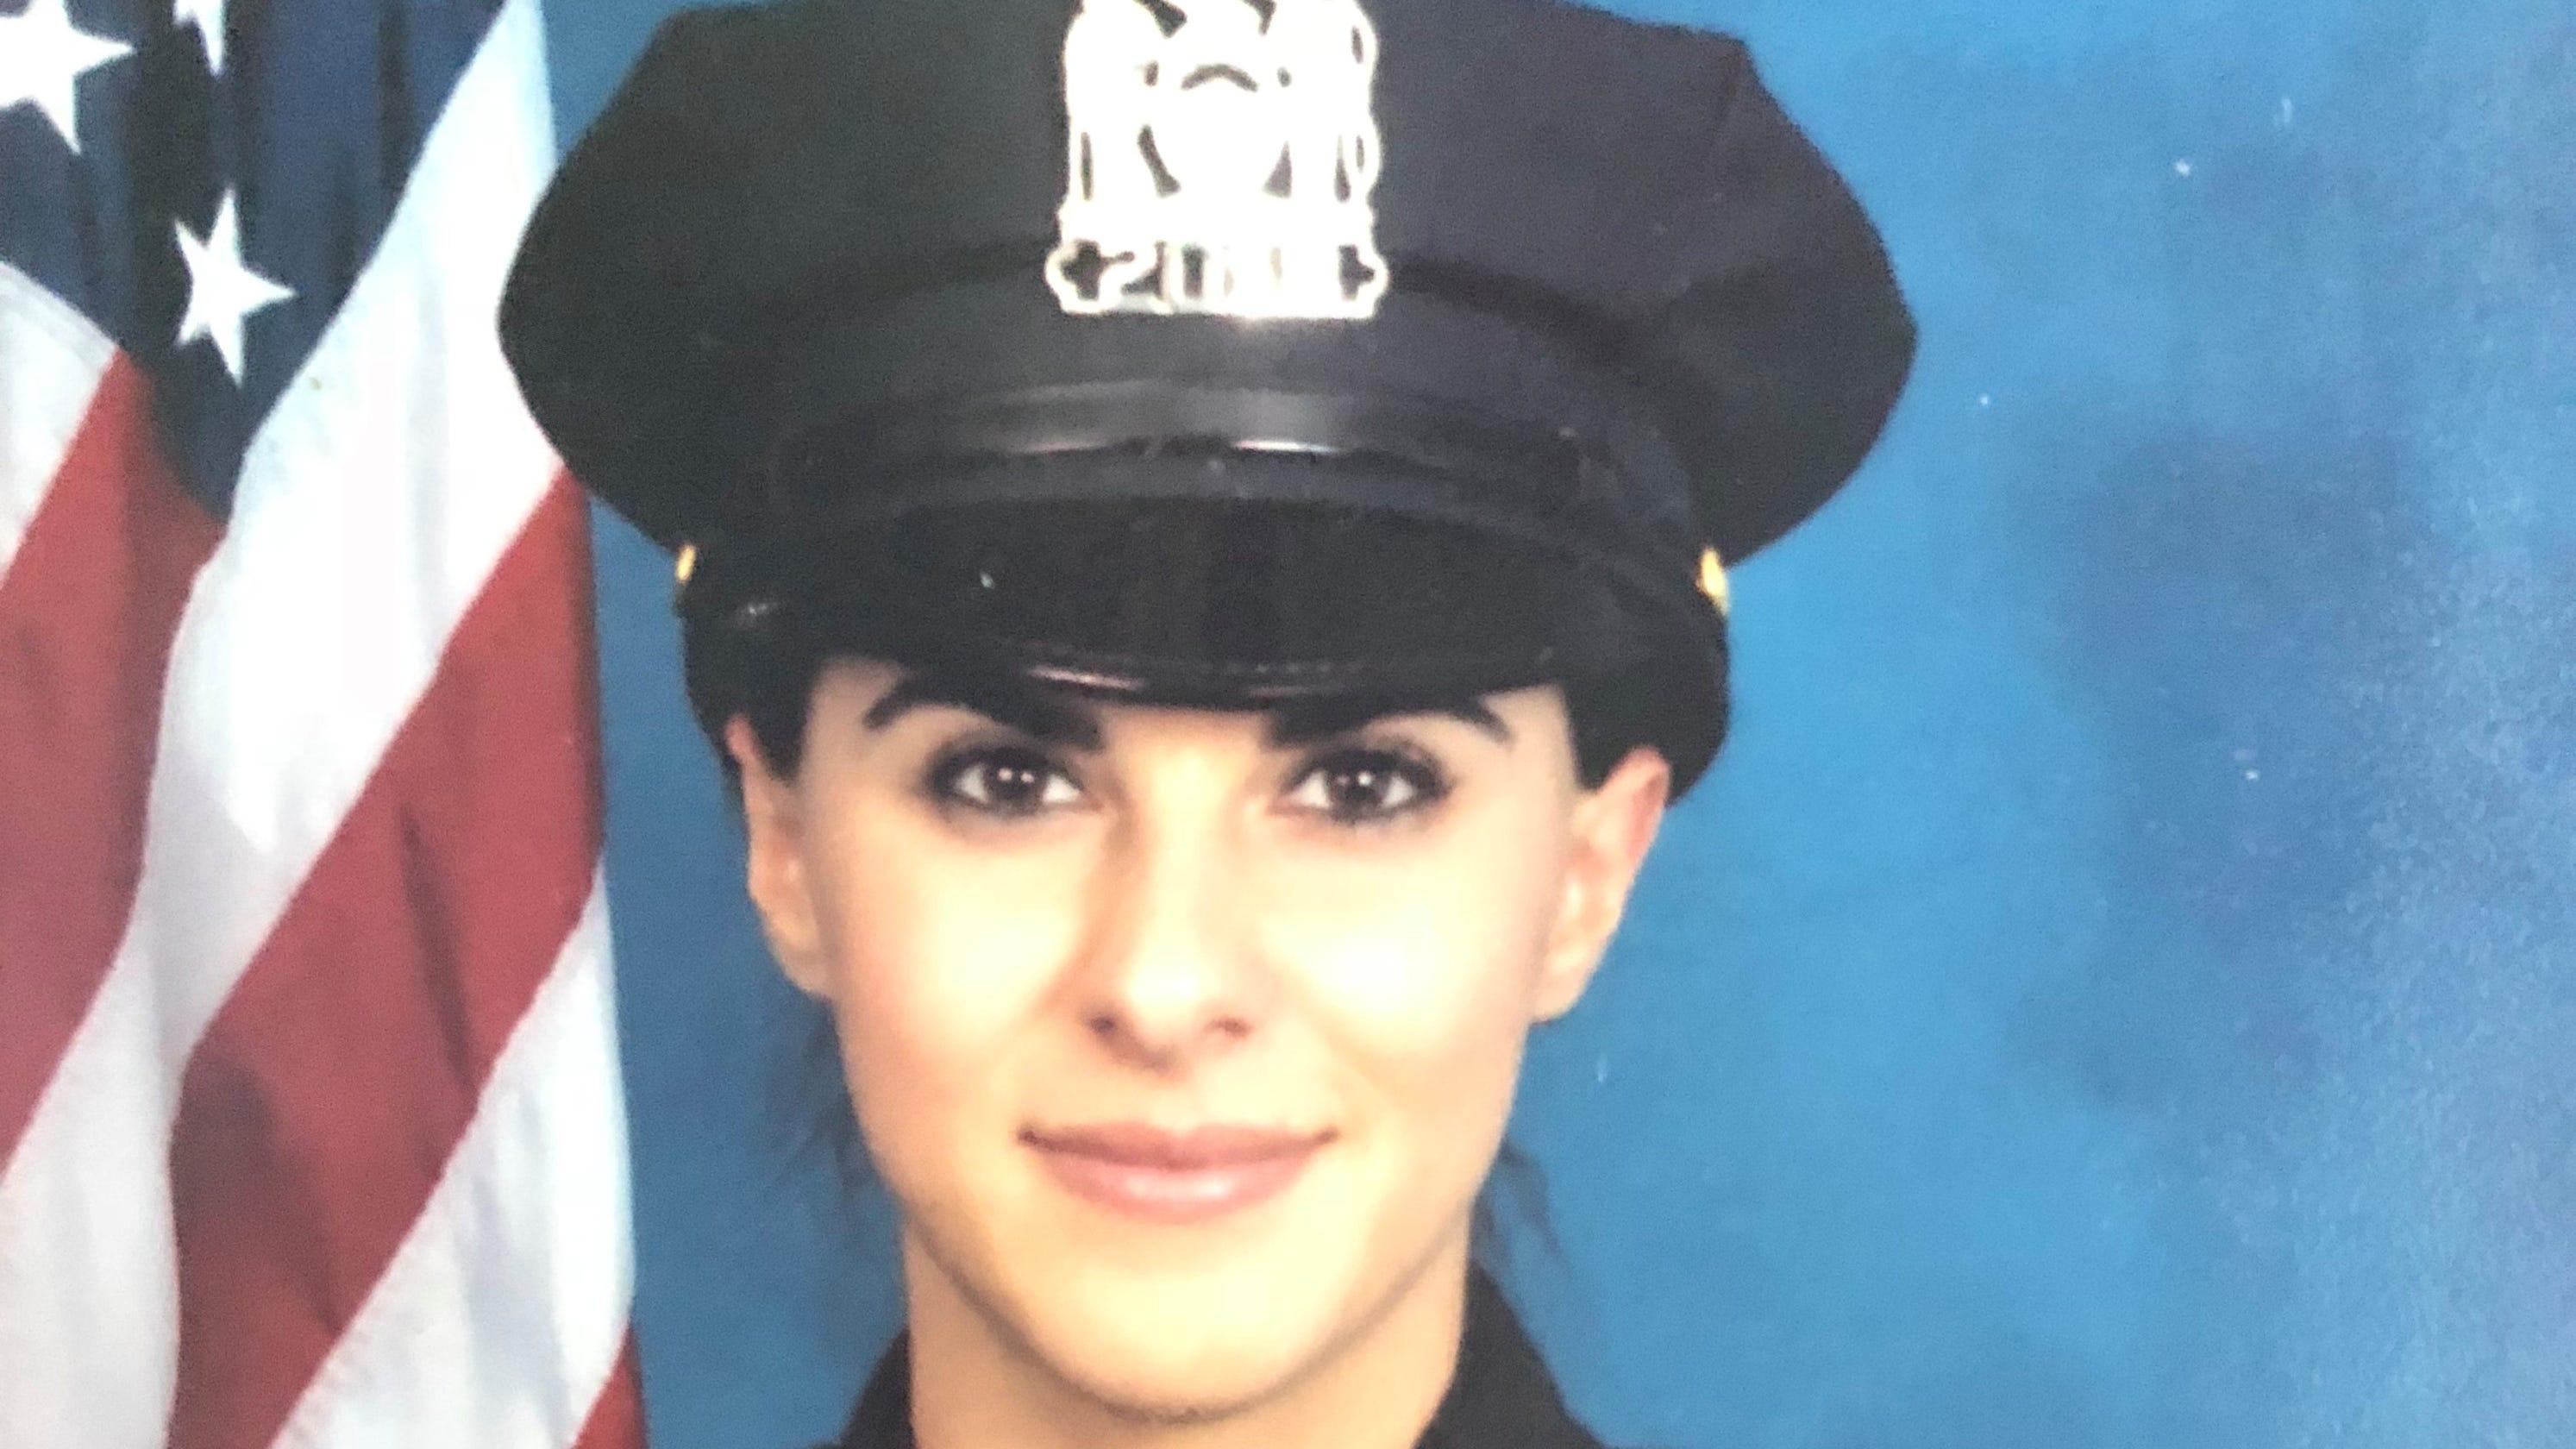 hastings on hudson police officer jessie ferreira cavallo saves boy